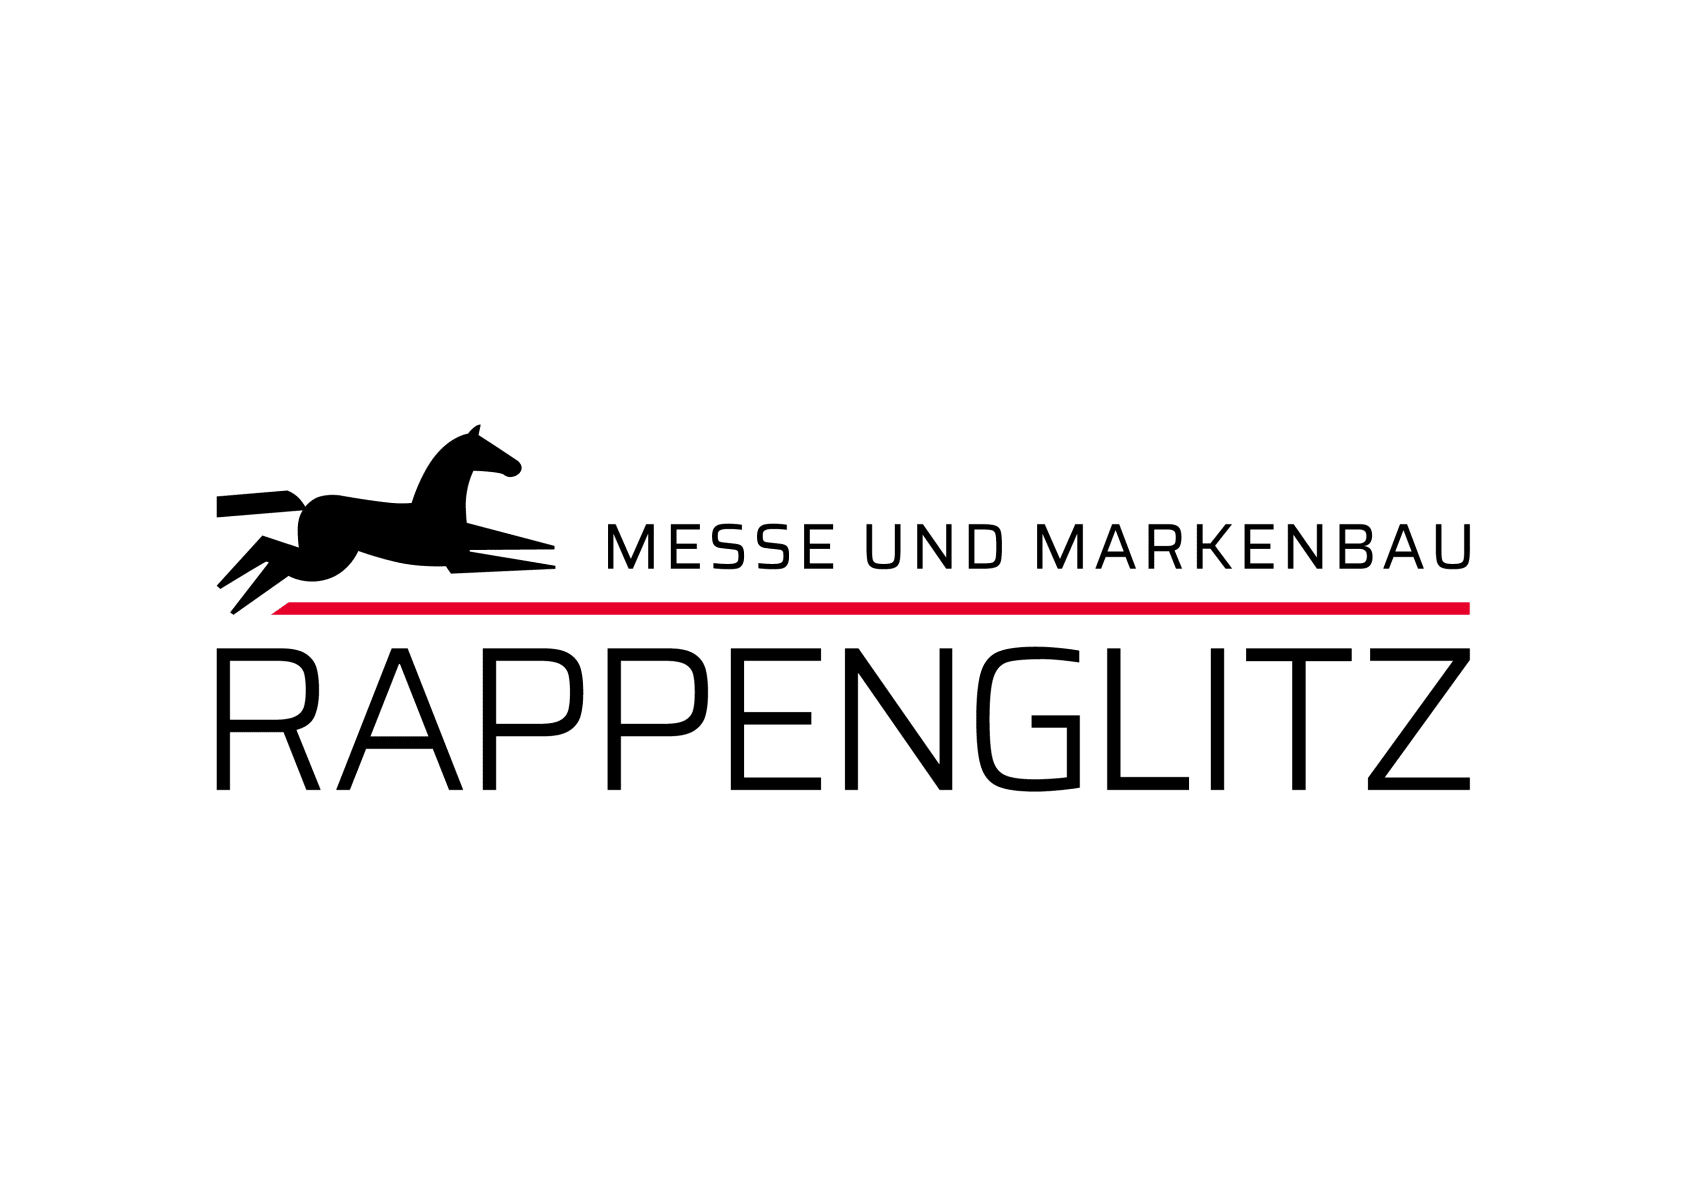 Rappenglitz